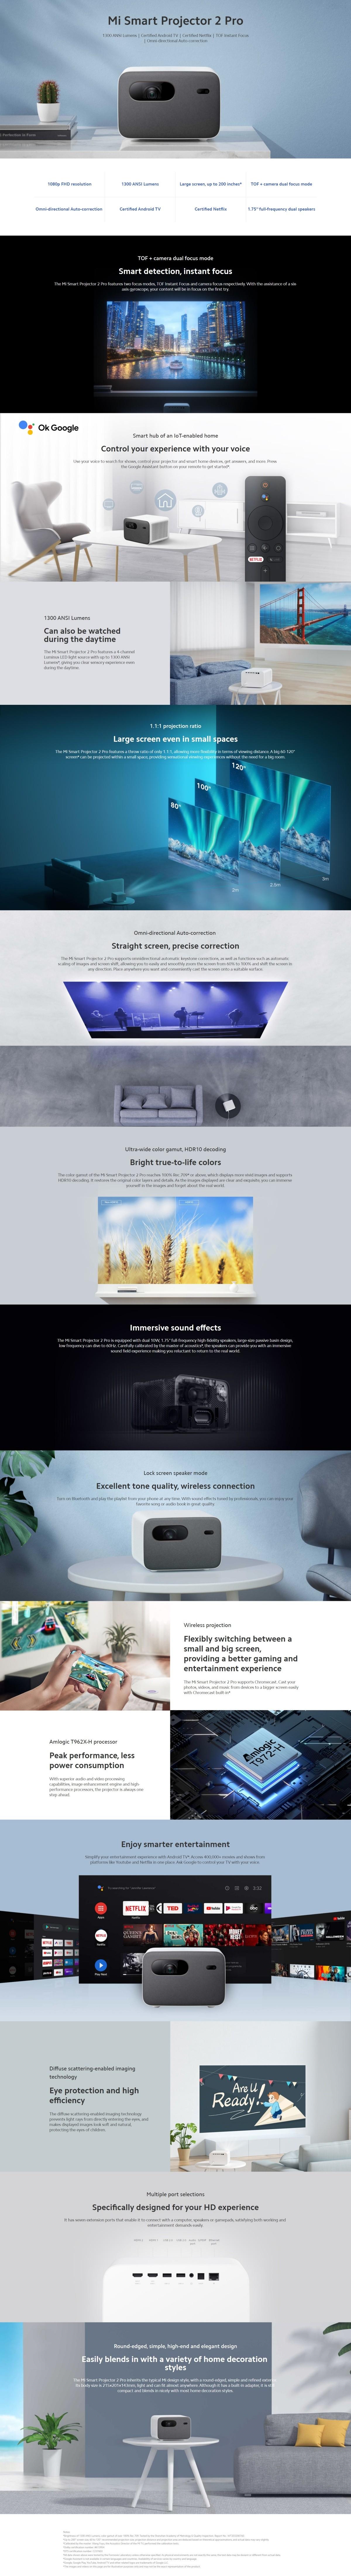 Xiaomi-Mi-Smart-Projector-2-Prode5122ac48415652.jpg